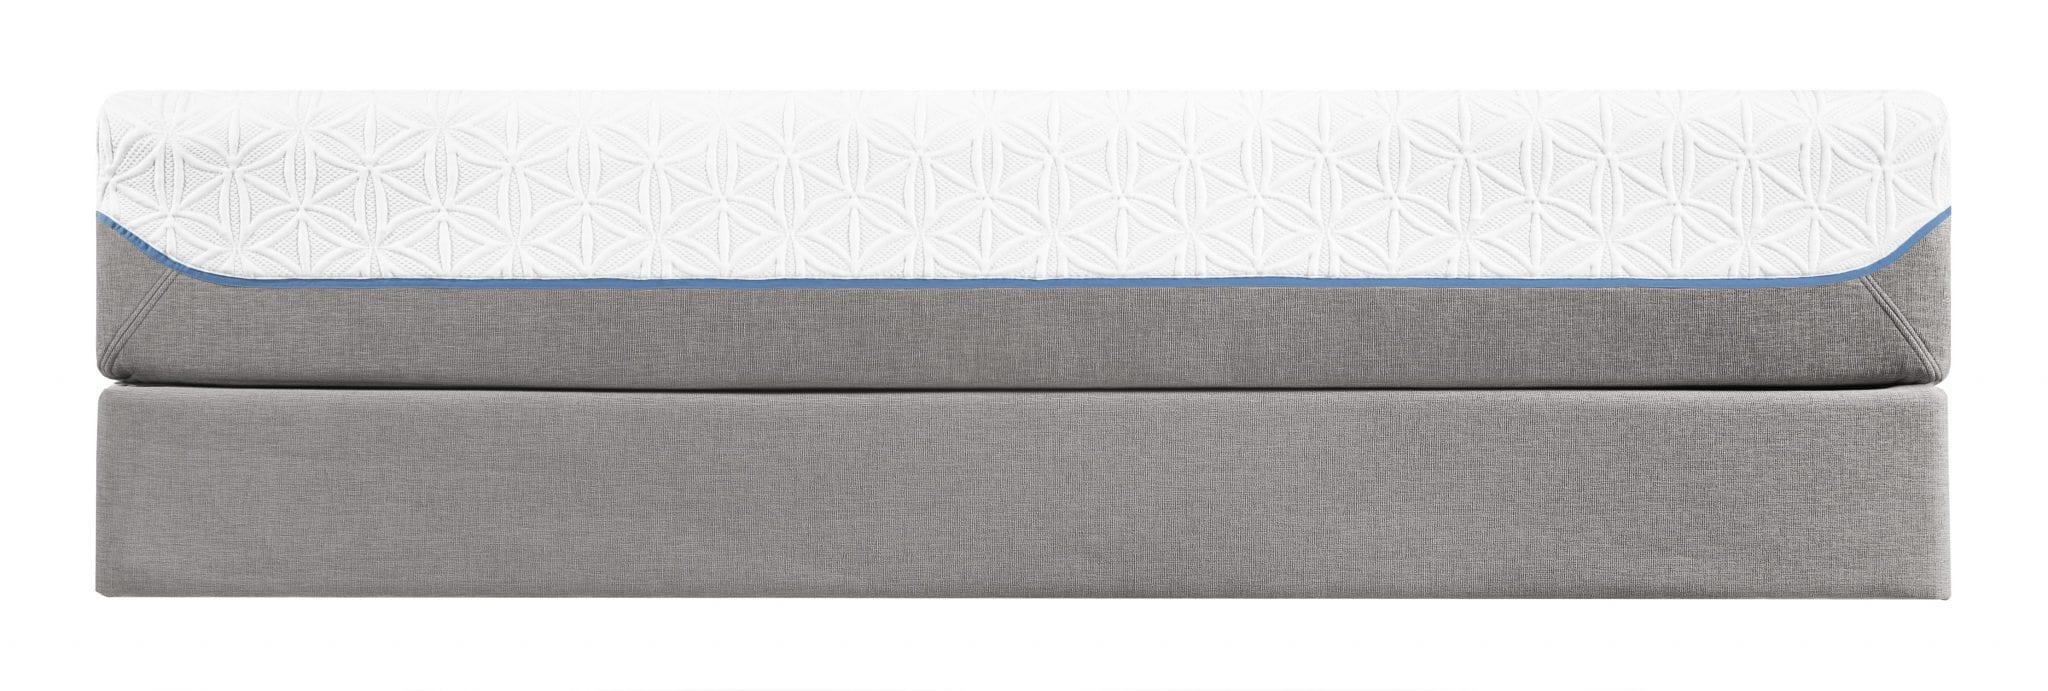 Beautyrest Black Platinum Bed Pillows Best Price